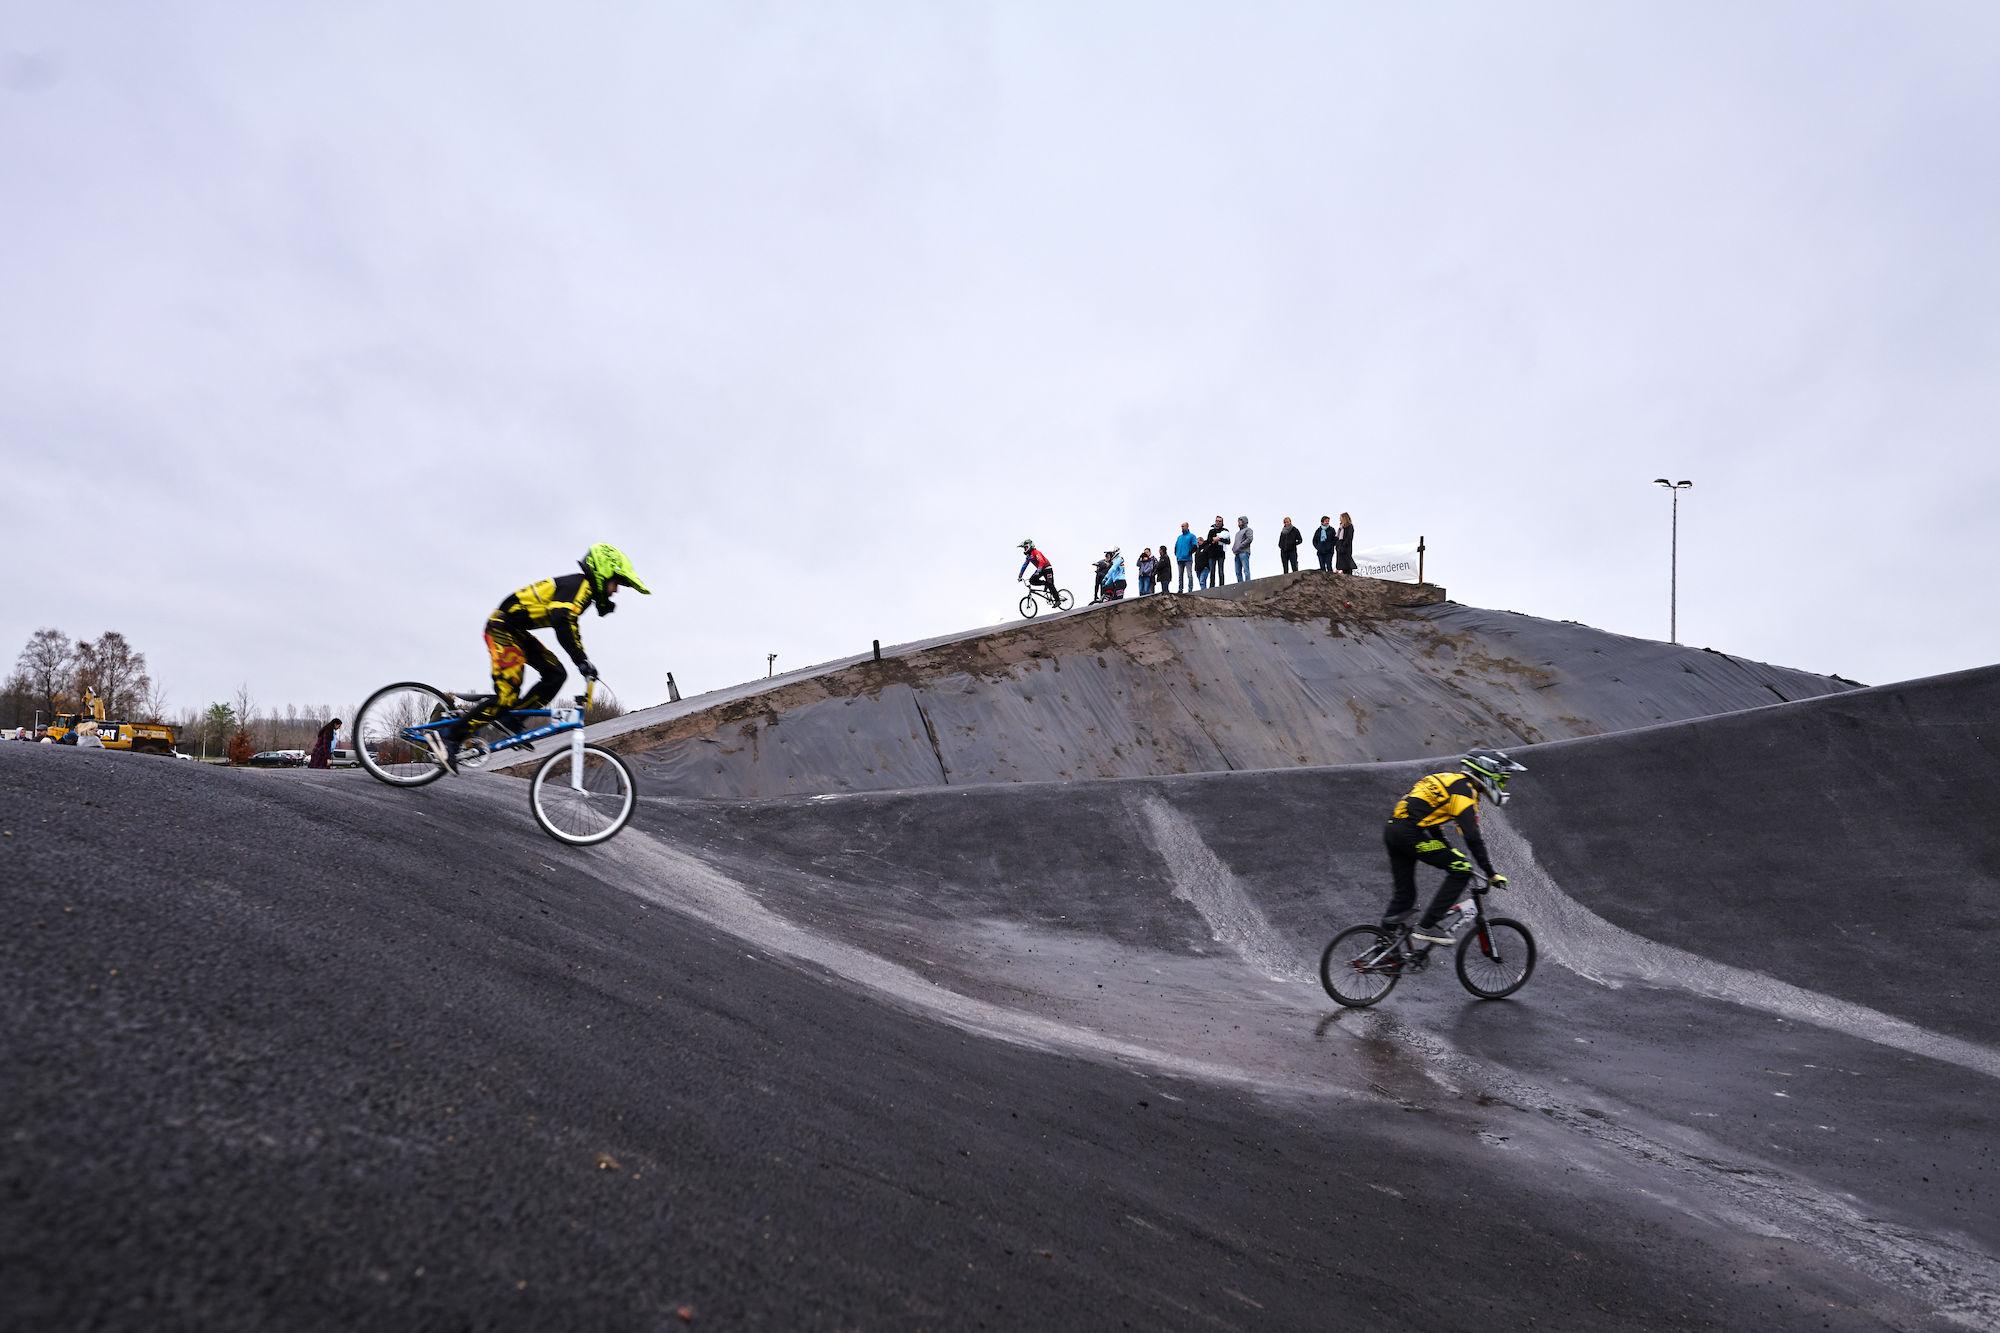 20181128 Puyenbroeck officiele opening BMX parcours.jpg